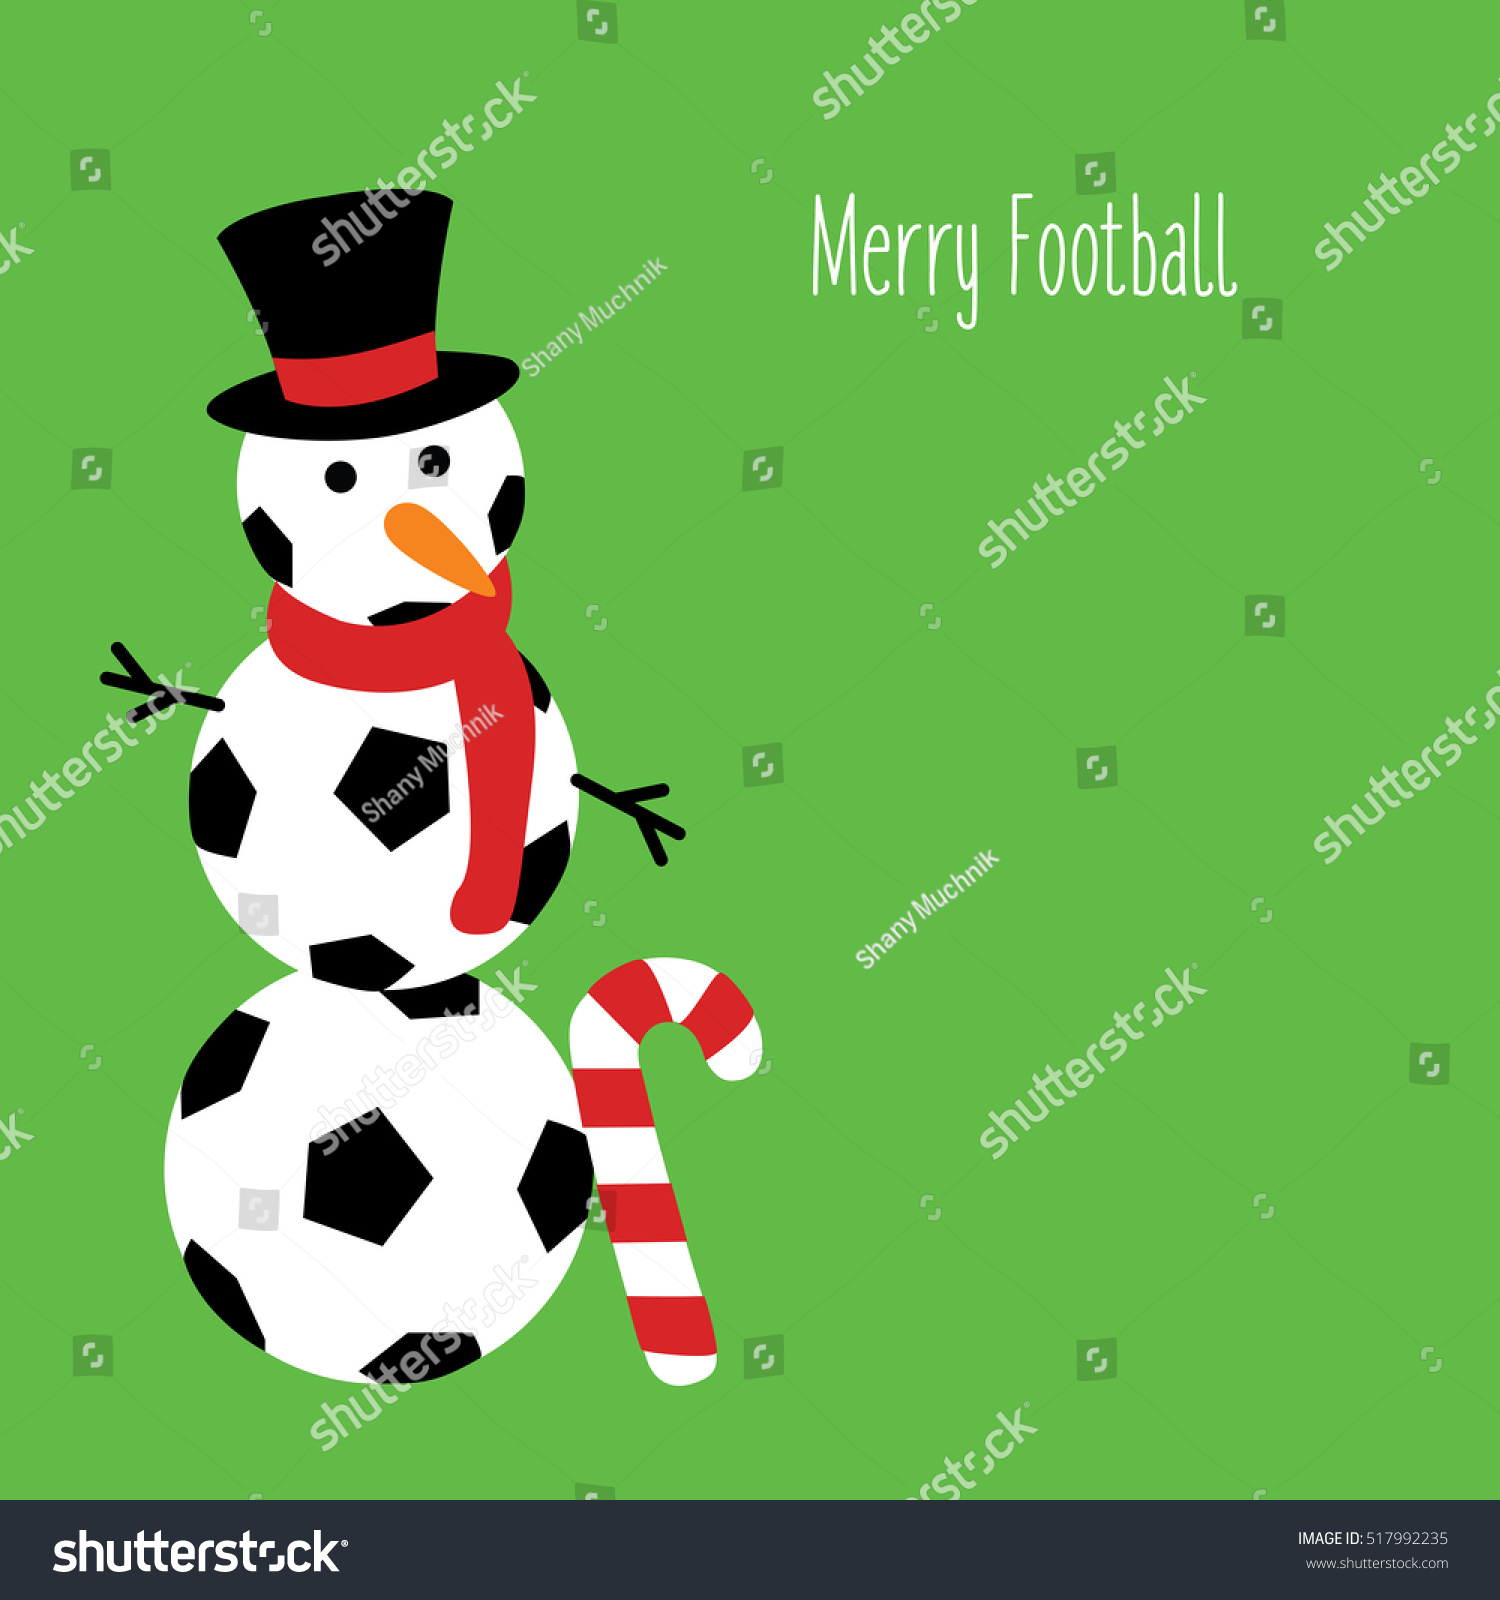 Snowman Football Text Merry Football Illustration Stock